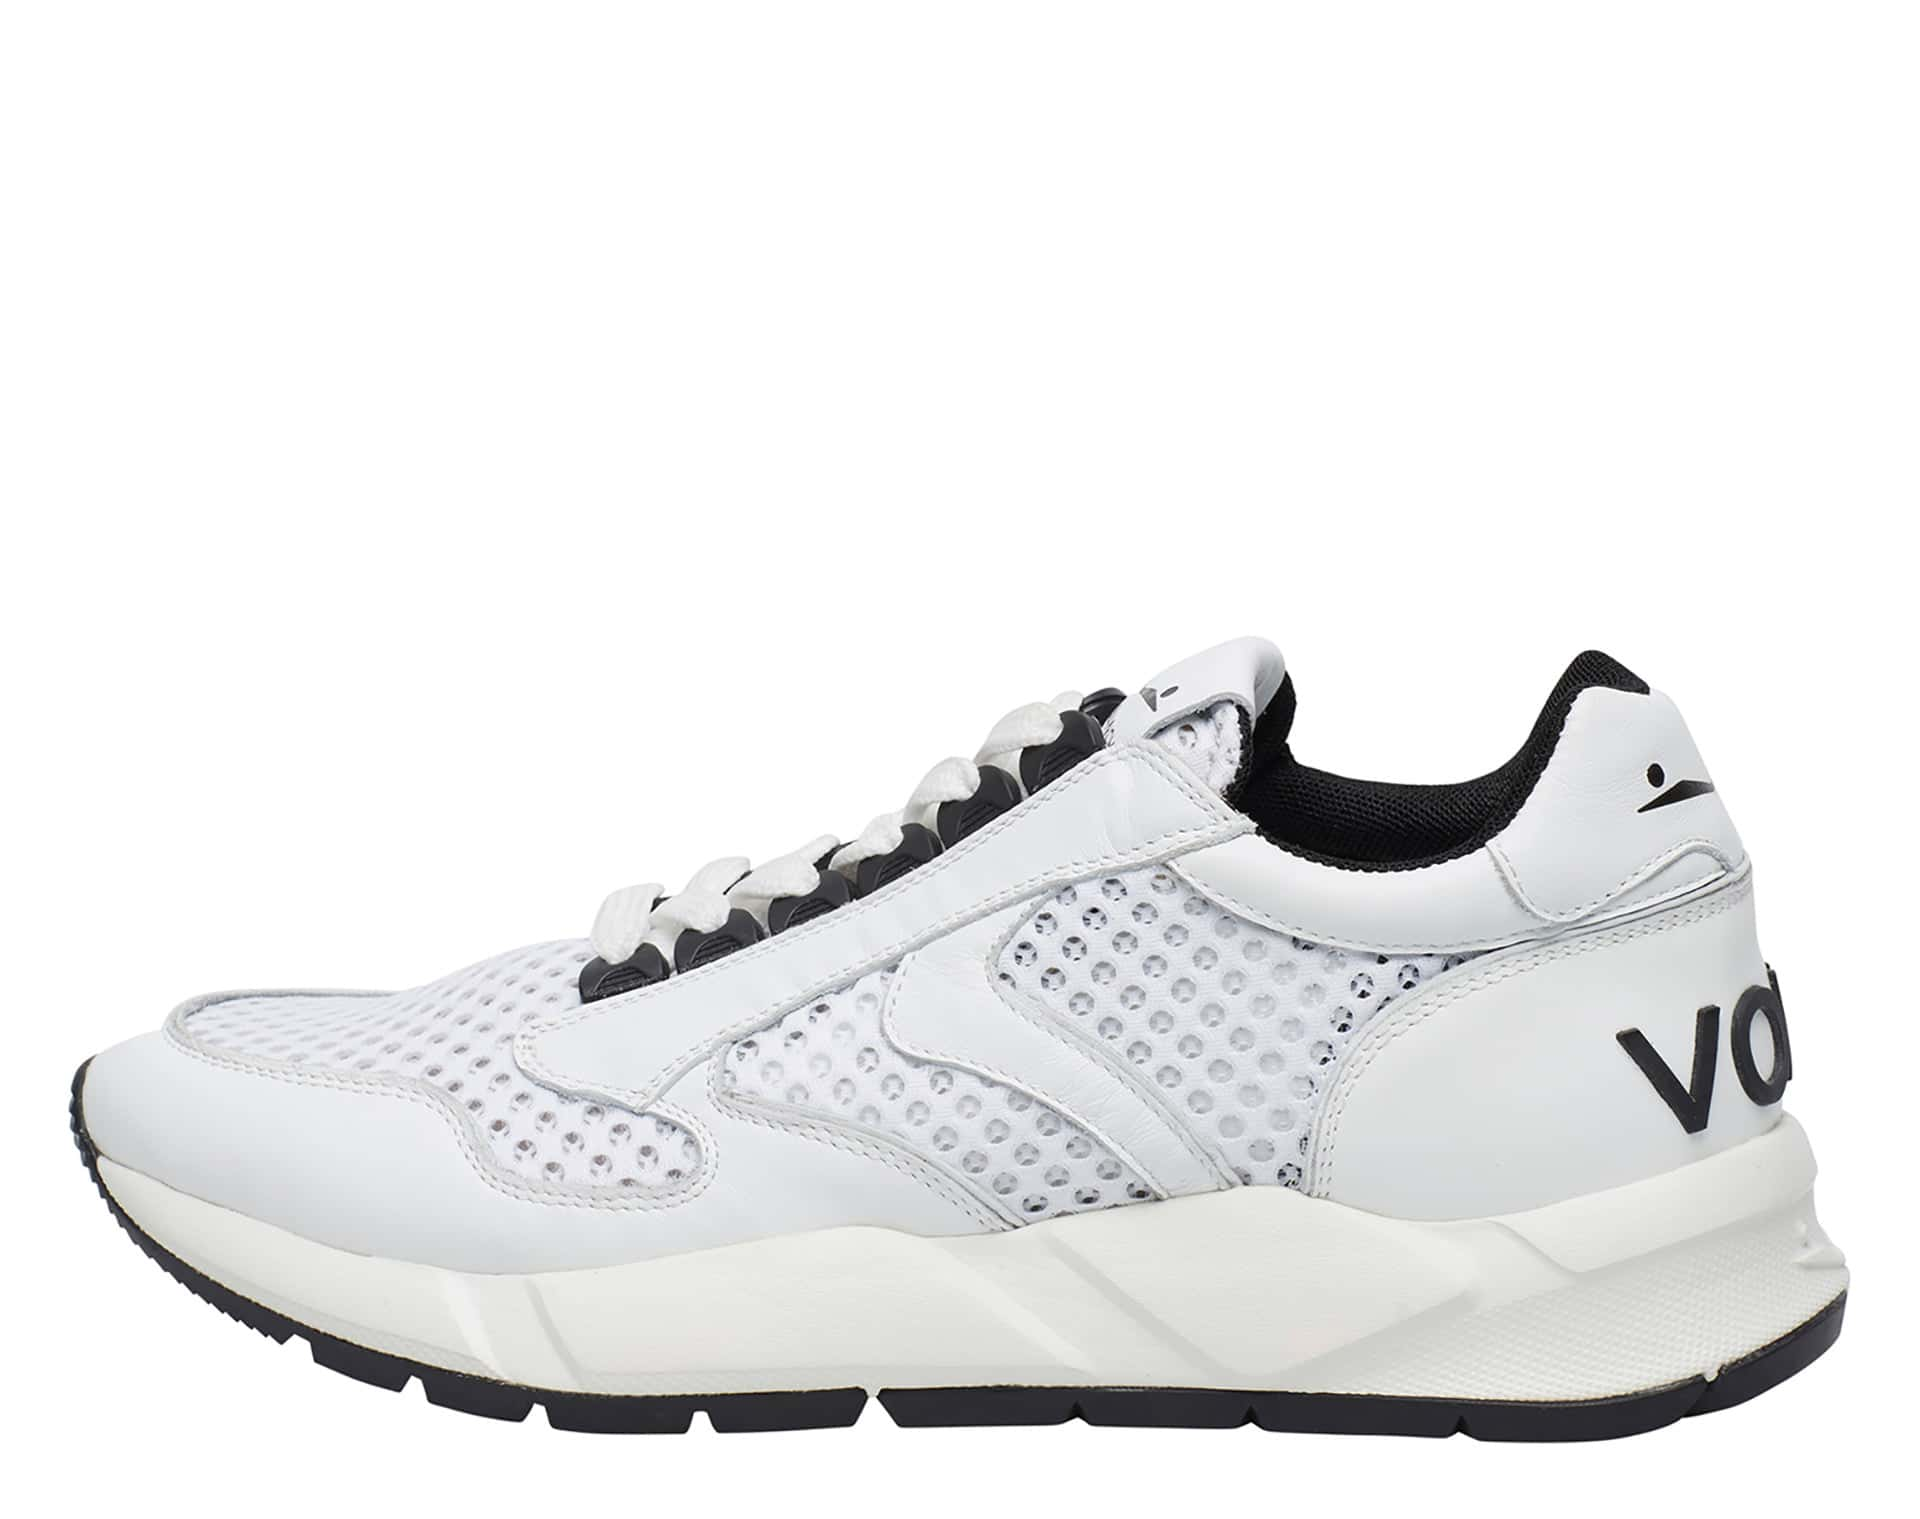 ARPOLH MESH EYELET - Sneakers in pelle e rete - Bianco